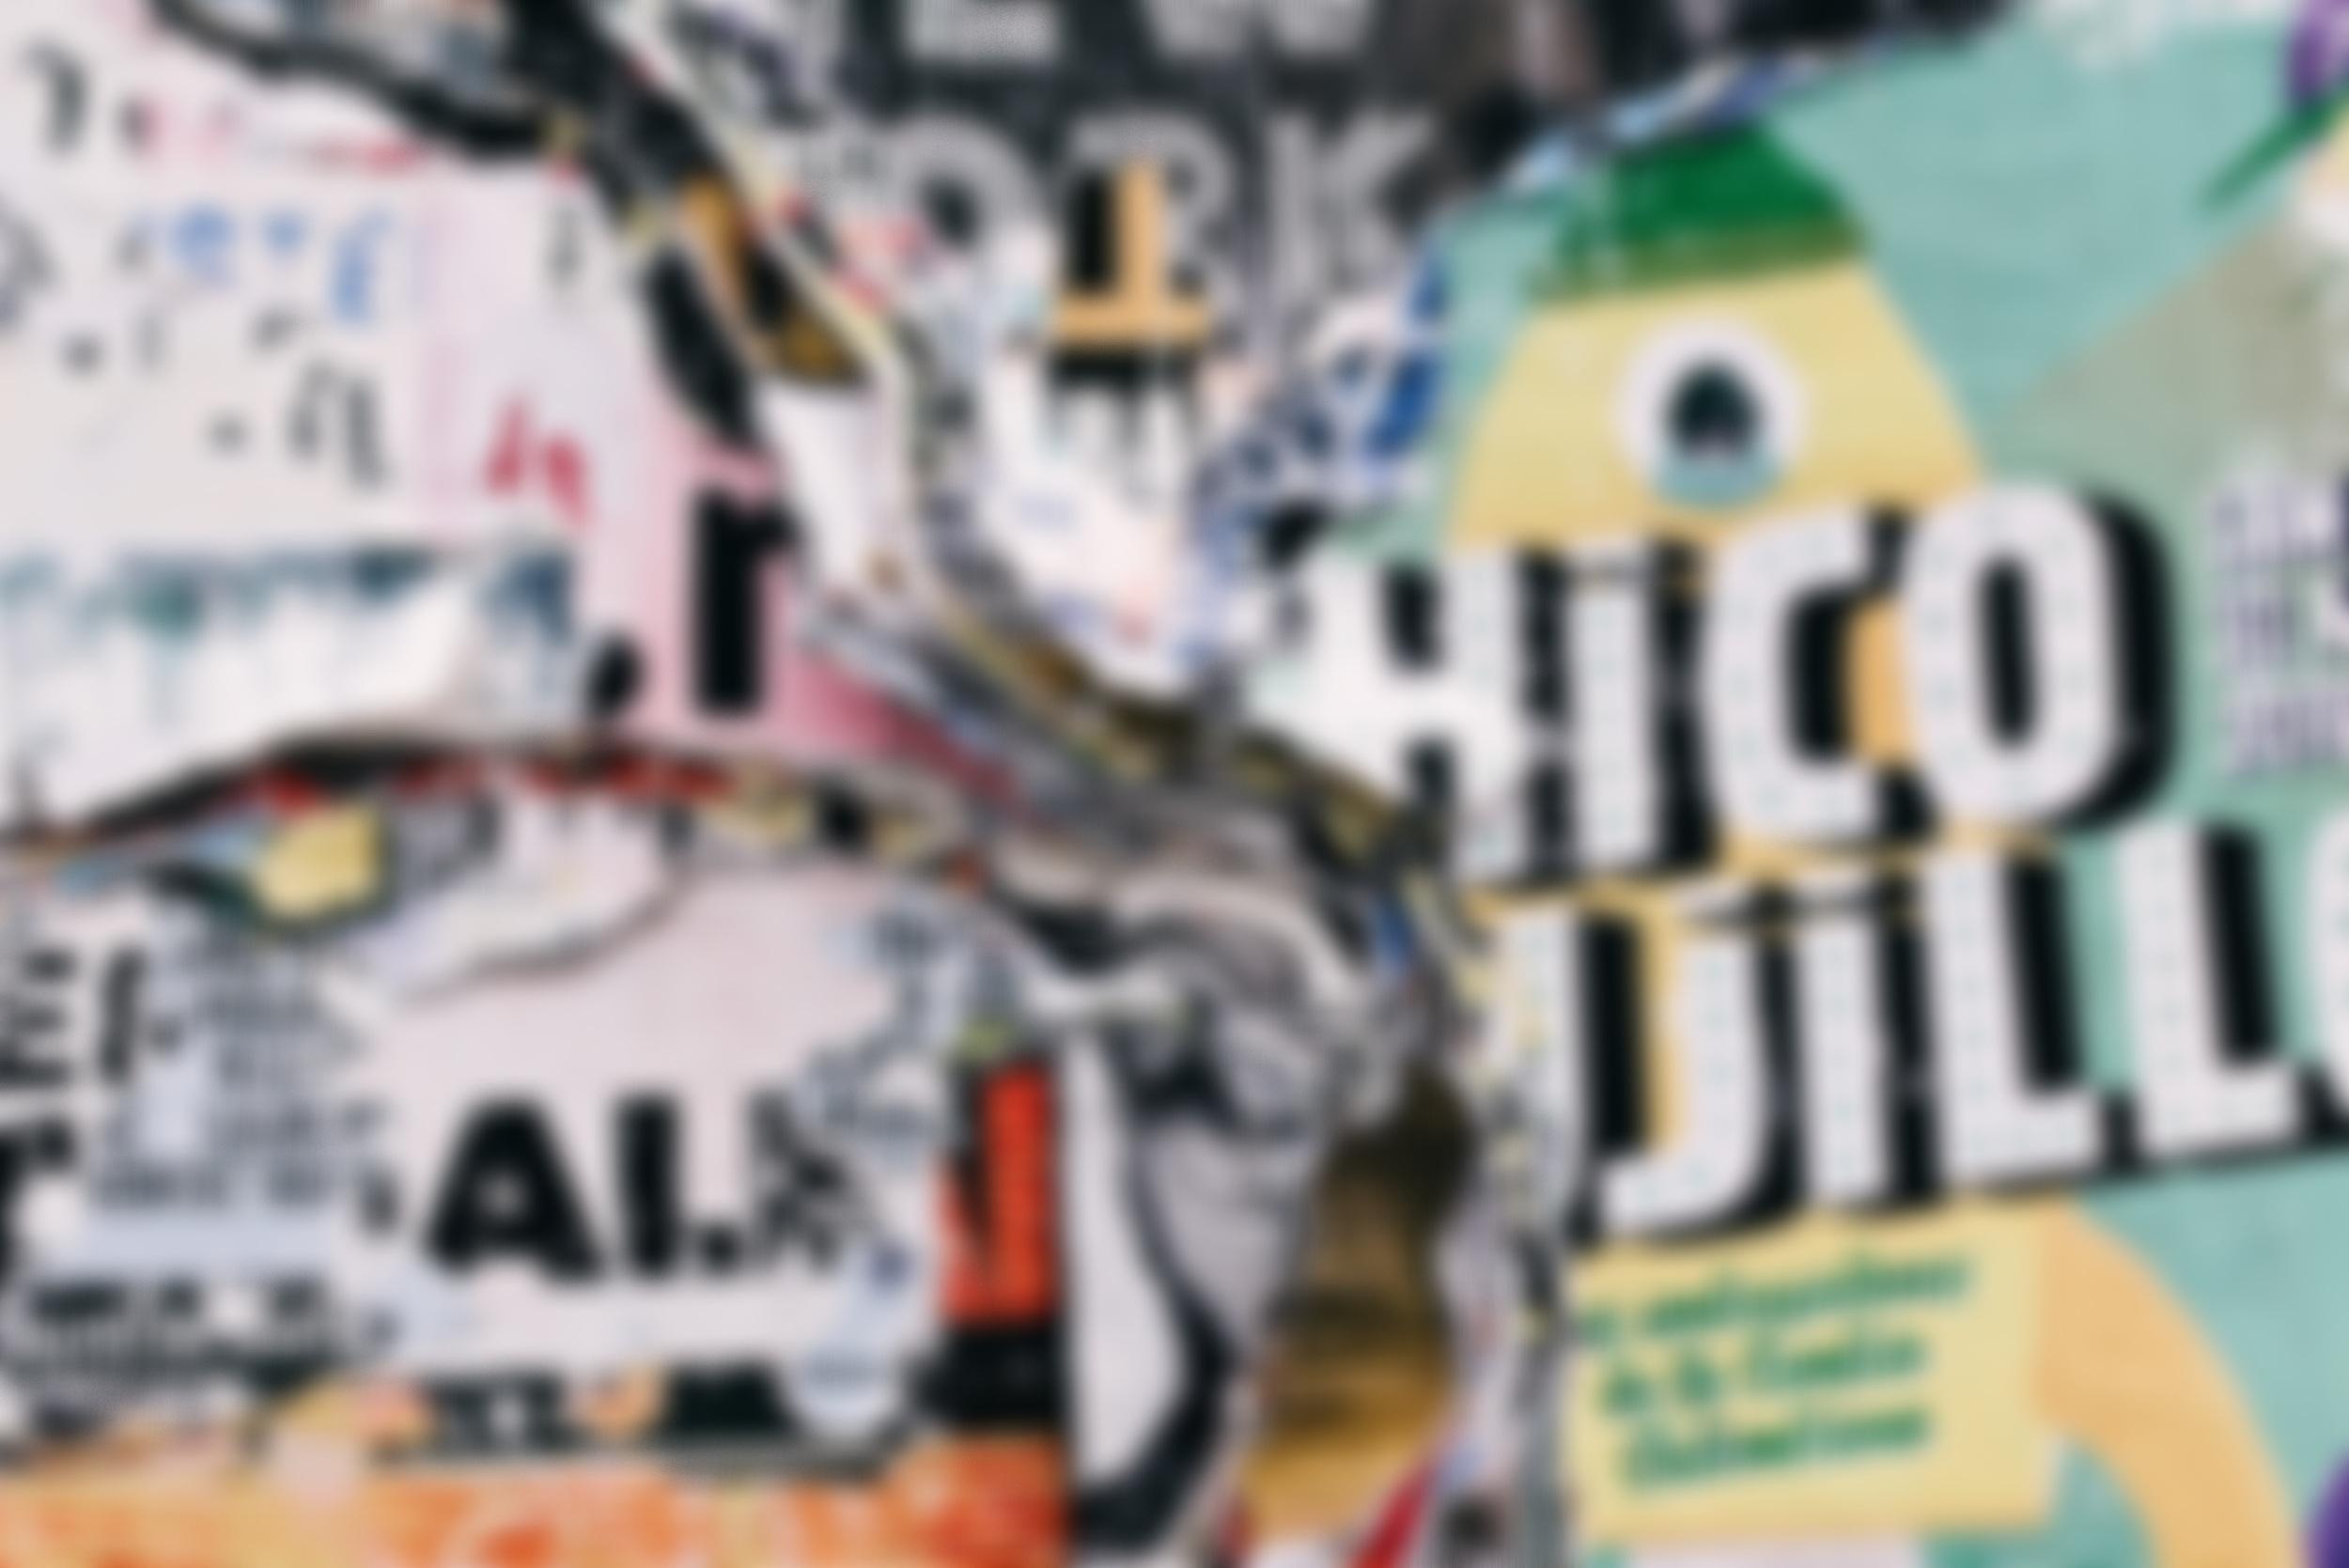 Art Walls - Local Artist Show Casing Their Masterpieces